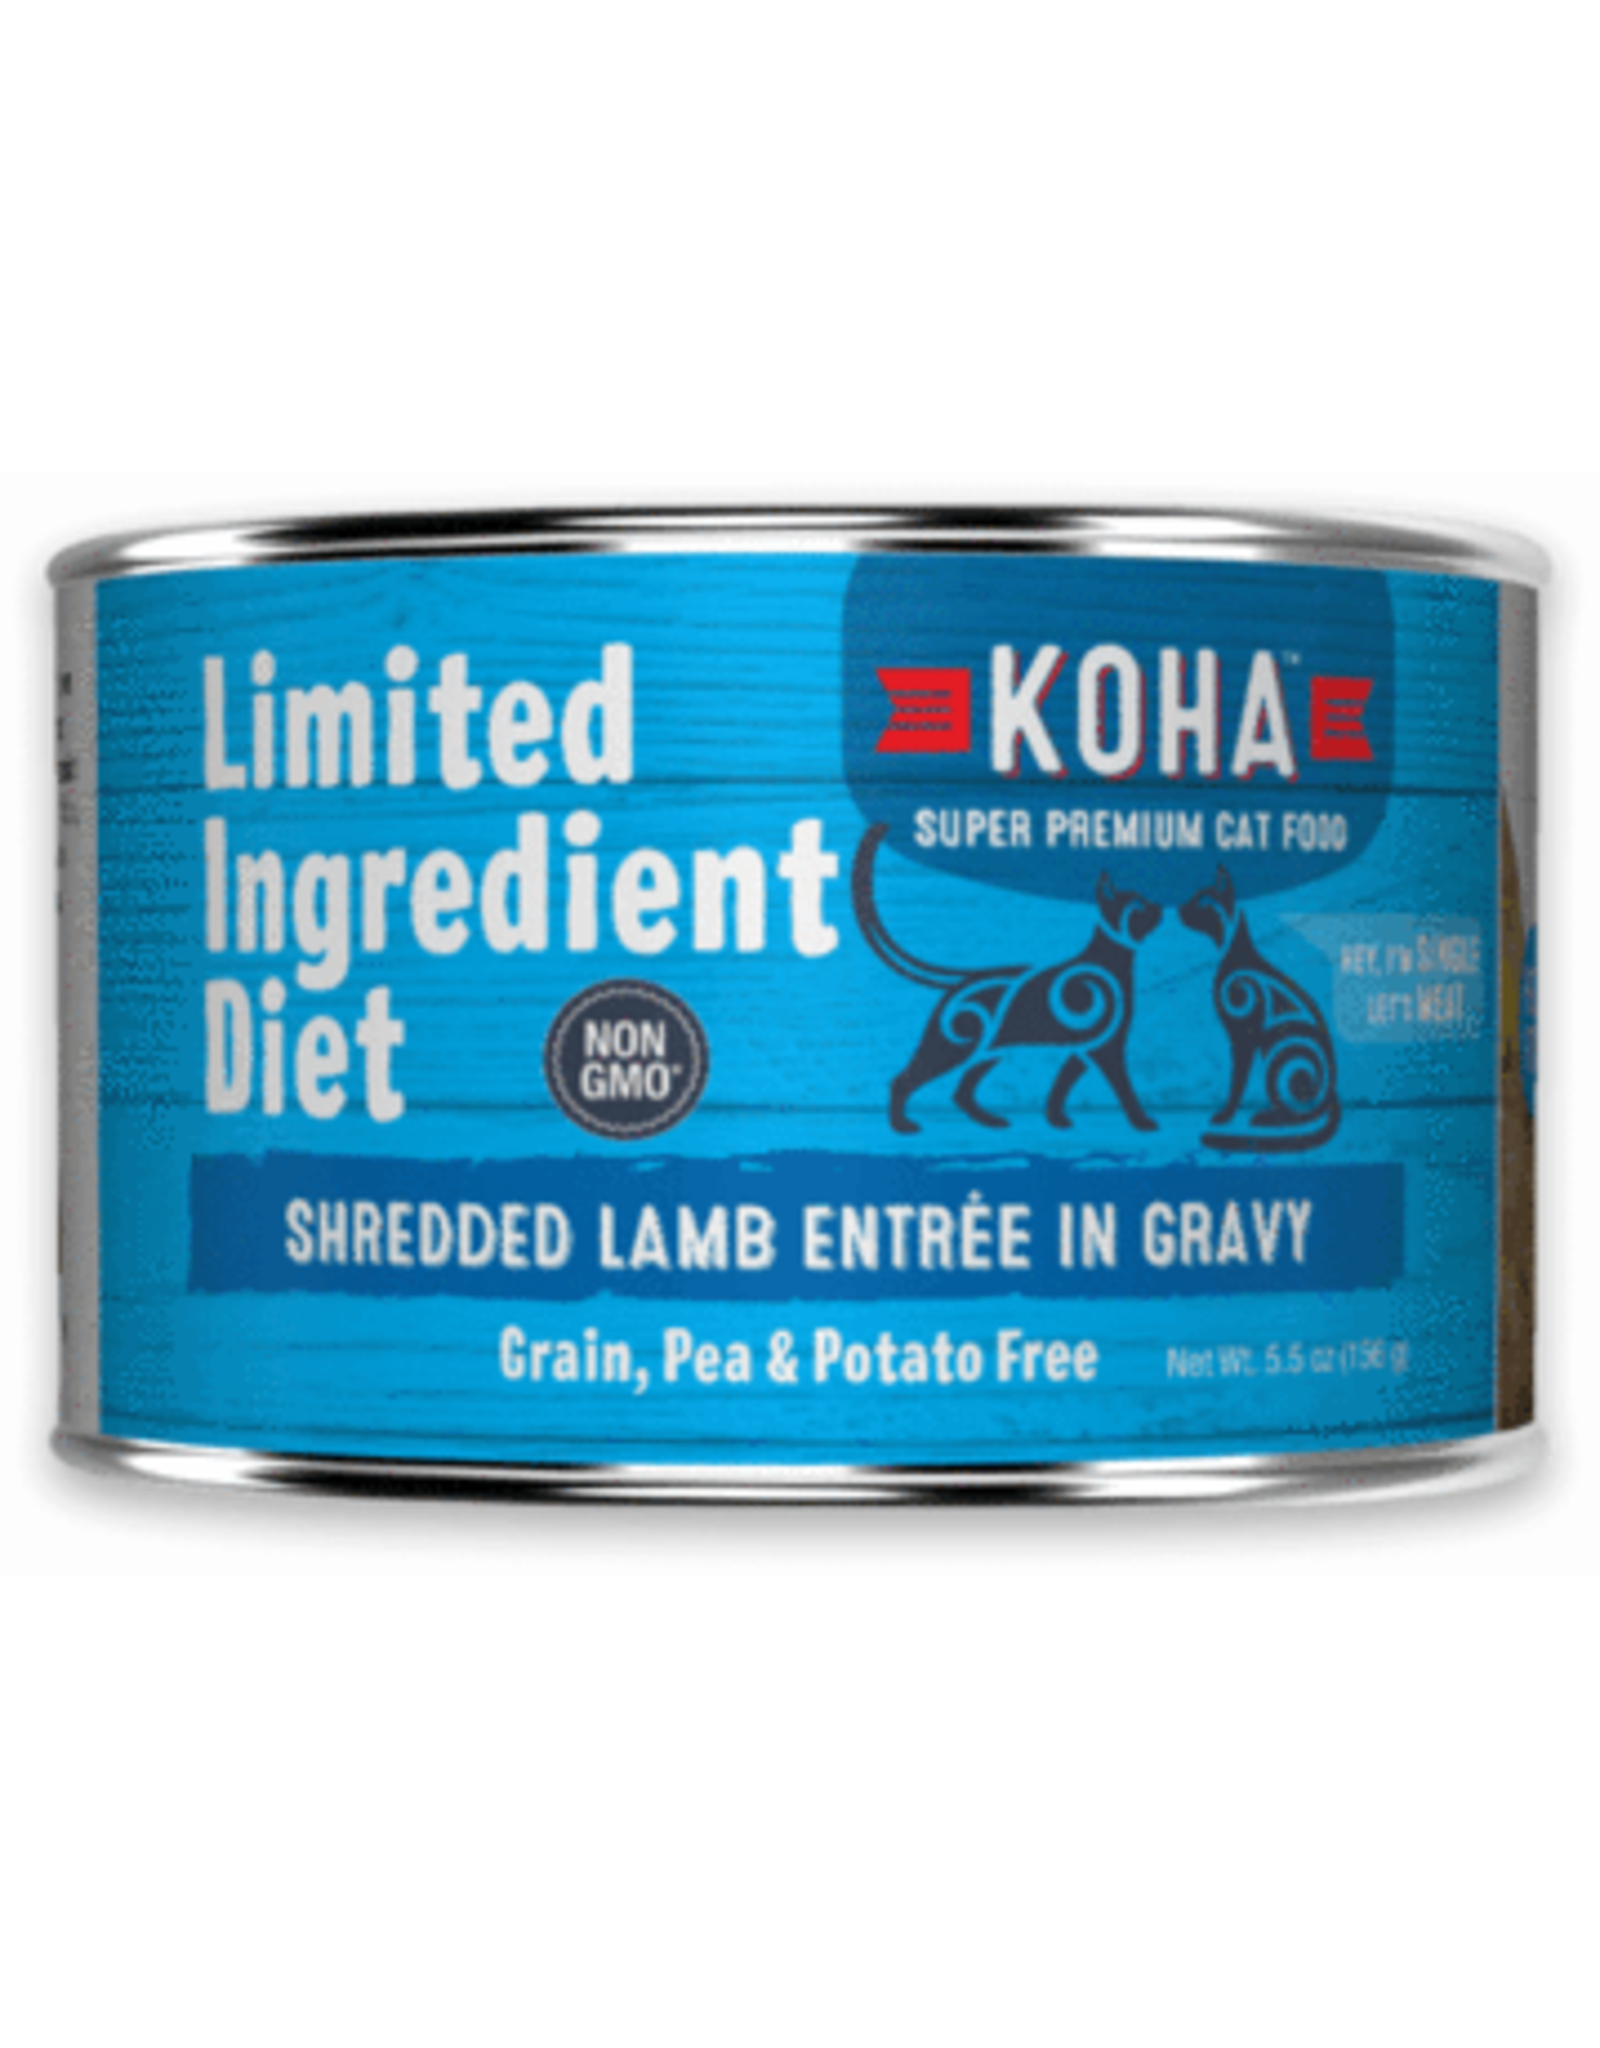 Koha Koha Wet Cat Food Limited Ingredient Diet Shredded Lamb Entree in Gravy 5.5oz Can Grain Free